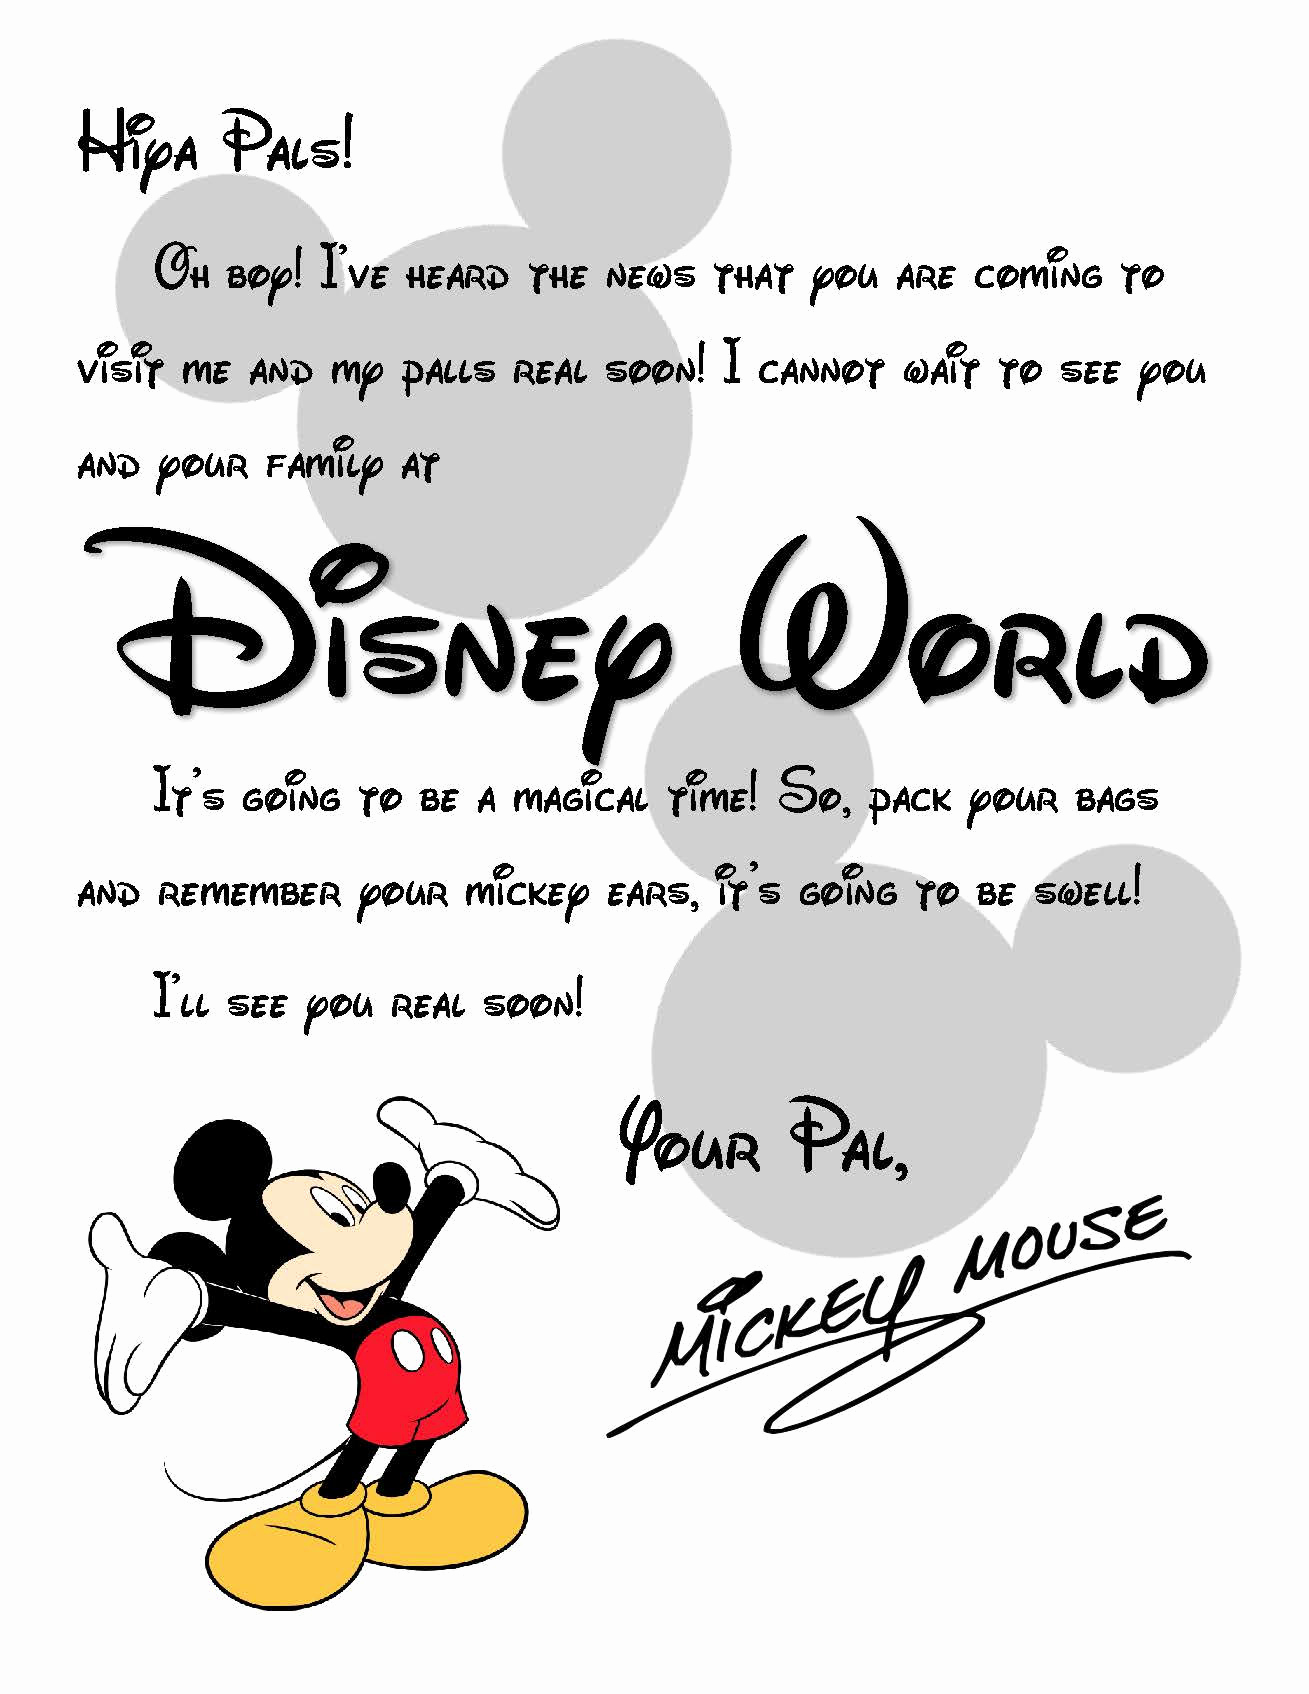 Disney World Invitation Letter Awesome Custom Disney World Letter From Mickey Invitation to